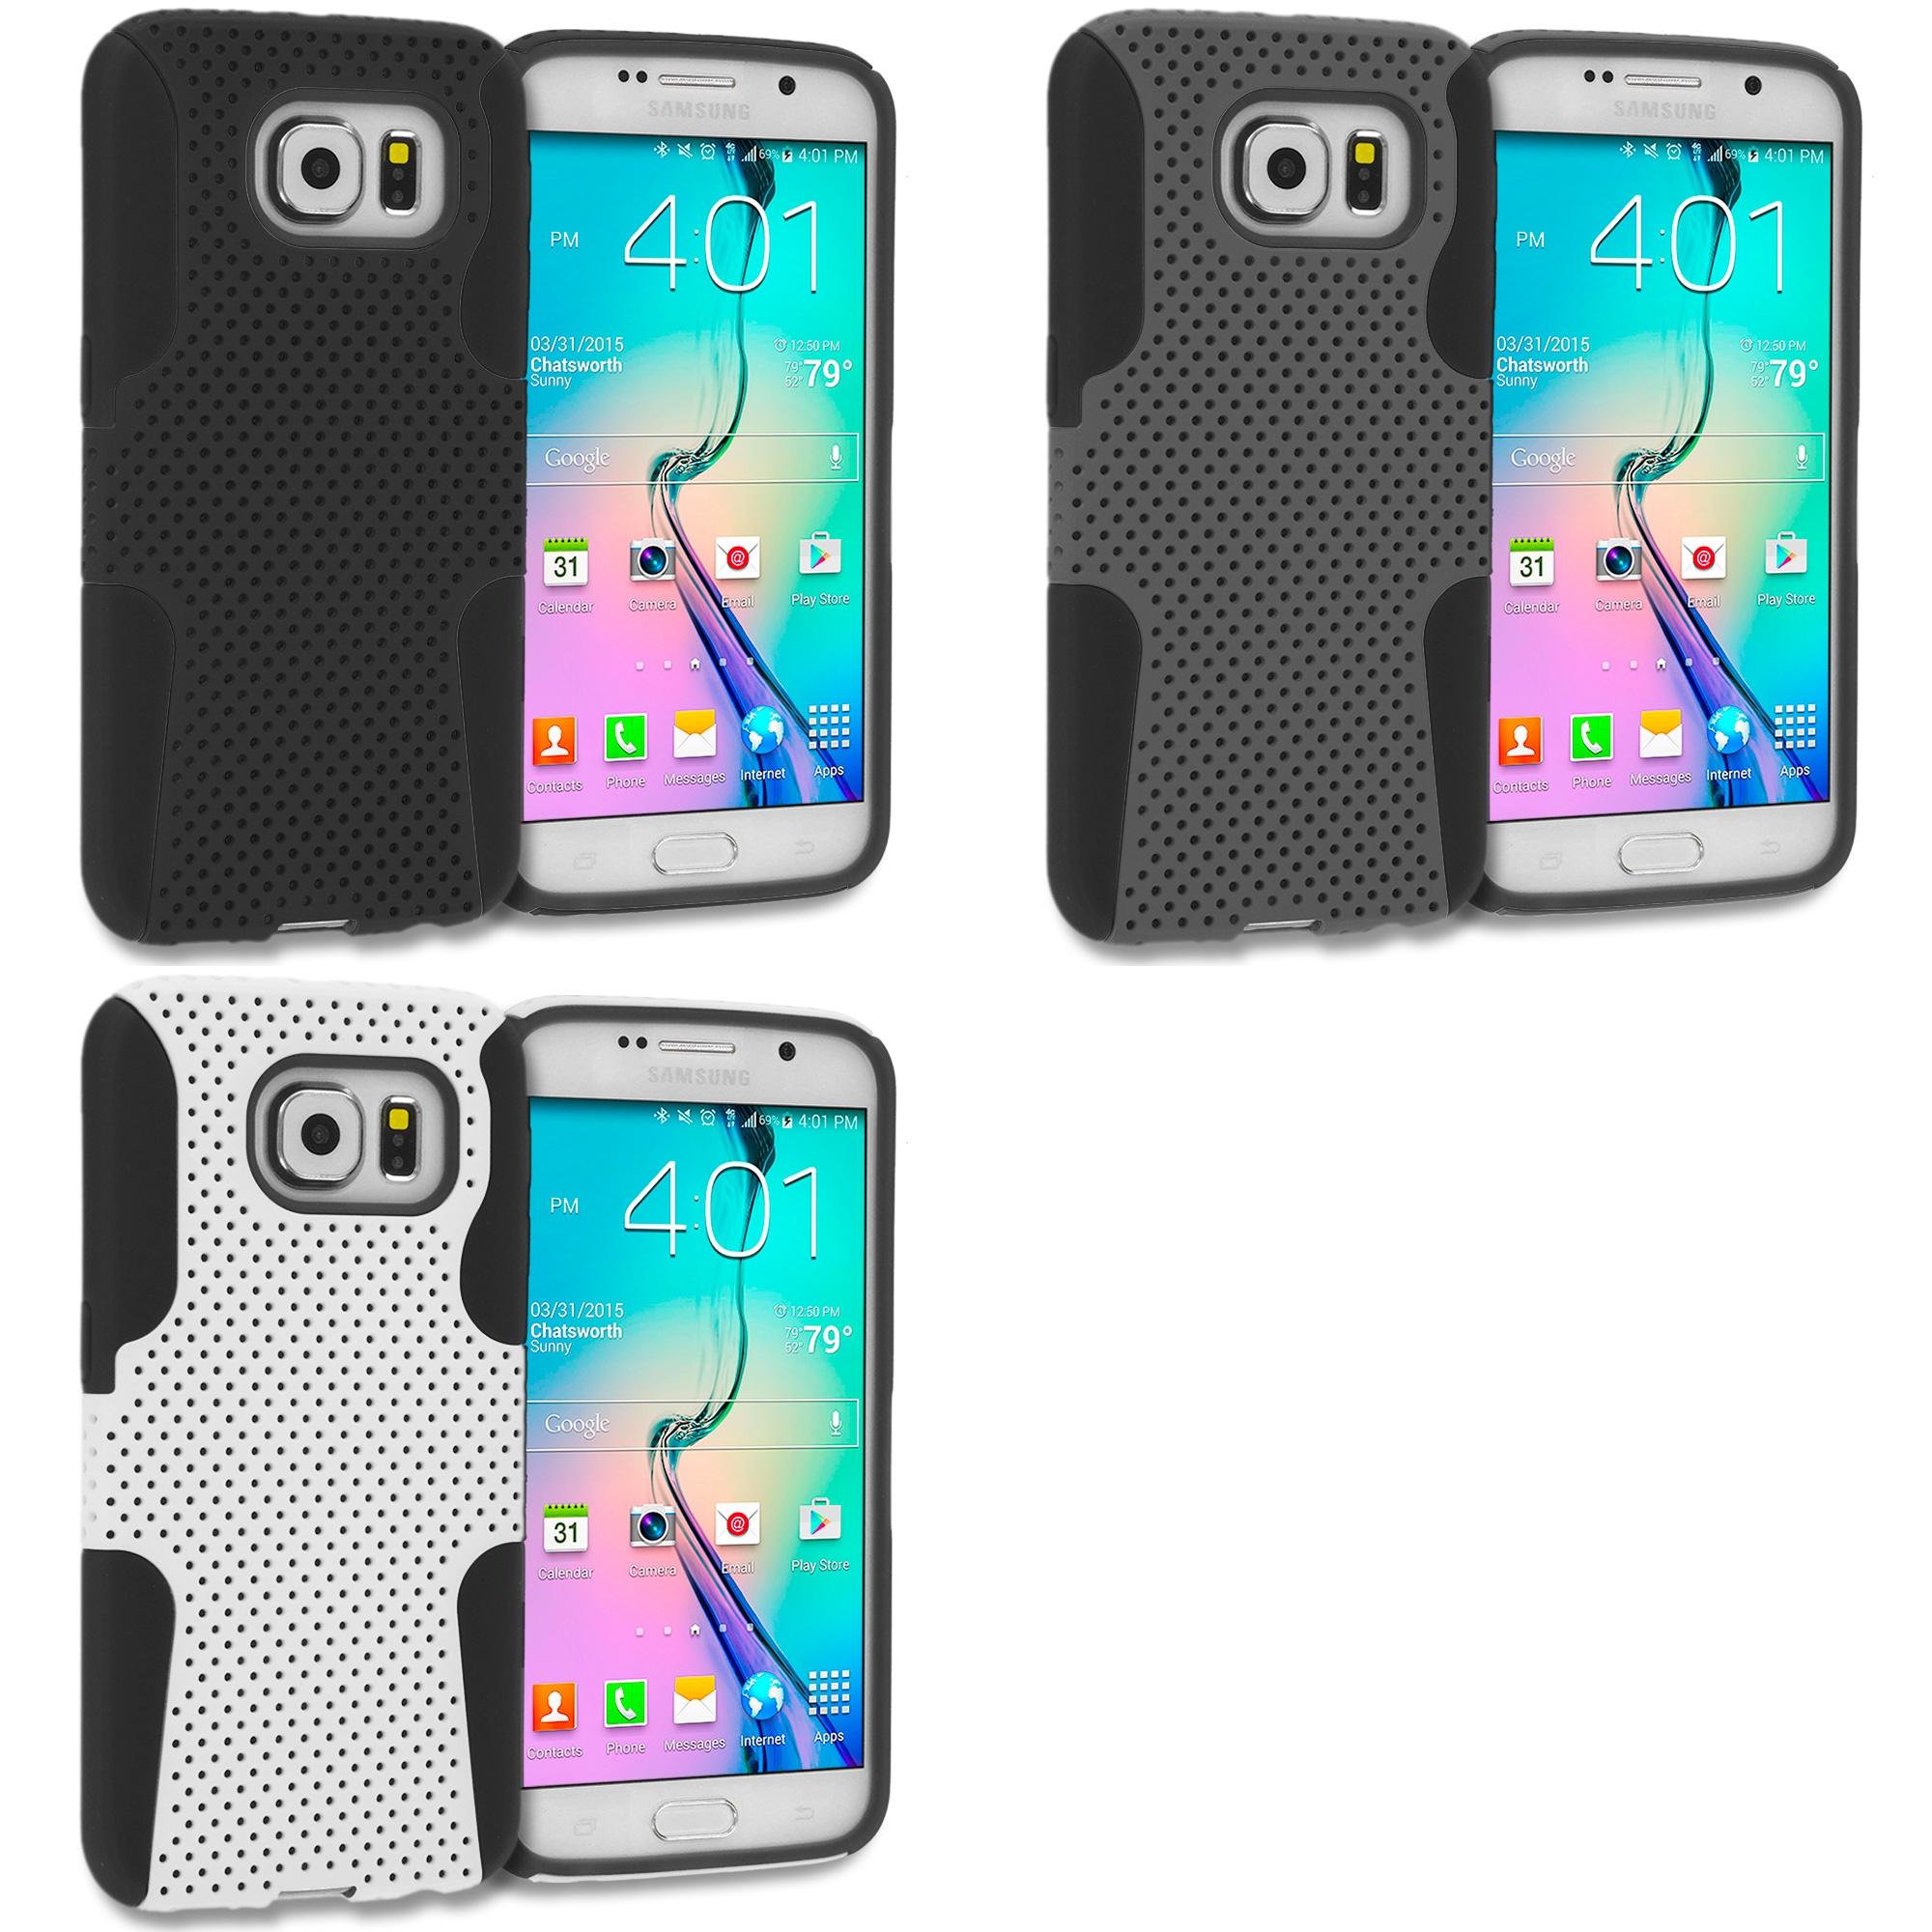 Samsung Galaxy S6 Combo Pack : Black / Black Hybrid Mesh Hard/Soft Case Cover